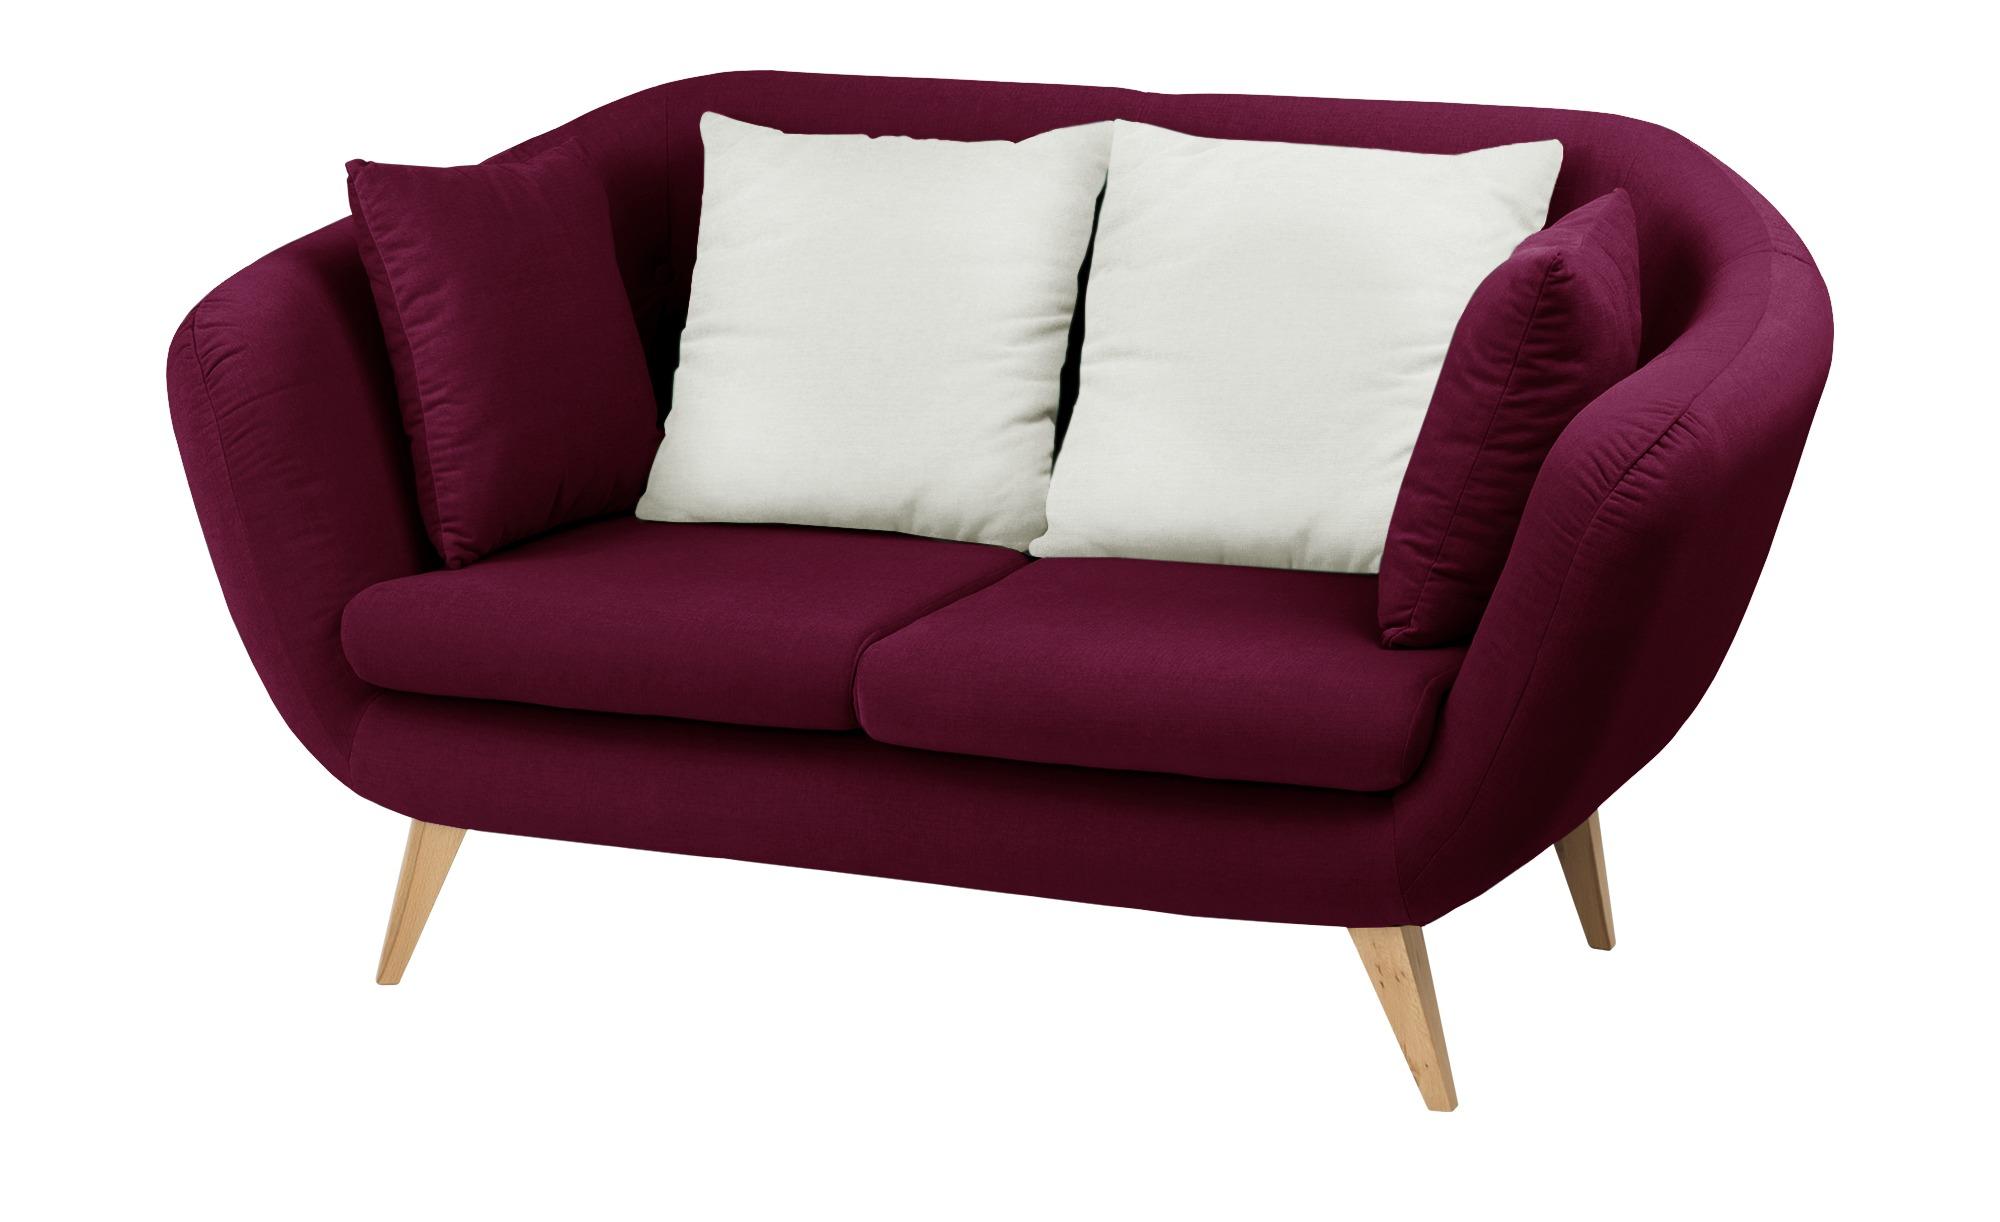 smart Sofa  bordeaux - Mikrofaser Ricarda ¦ rot ¦ Maße (cm): B: 176 H: 93 T: 90 Polstermöbel > Sofas > 2-Sitzer - Höffner